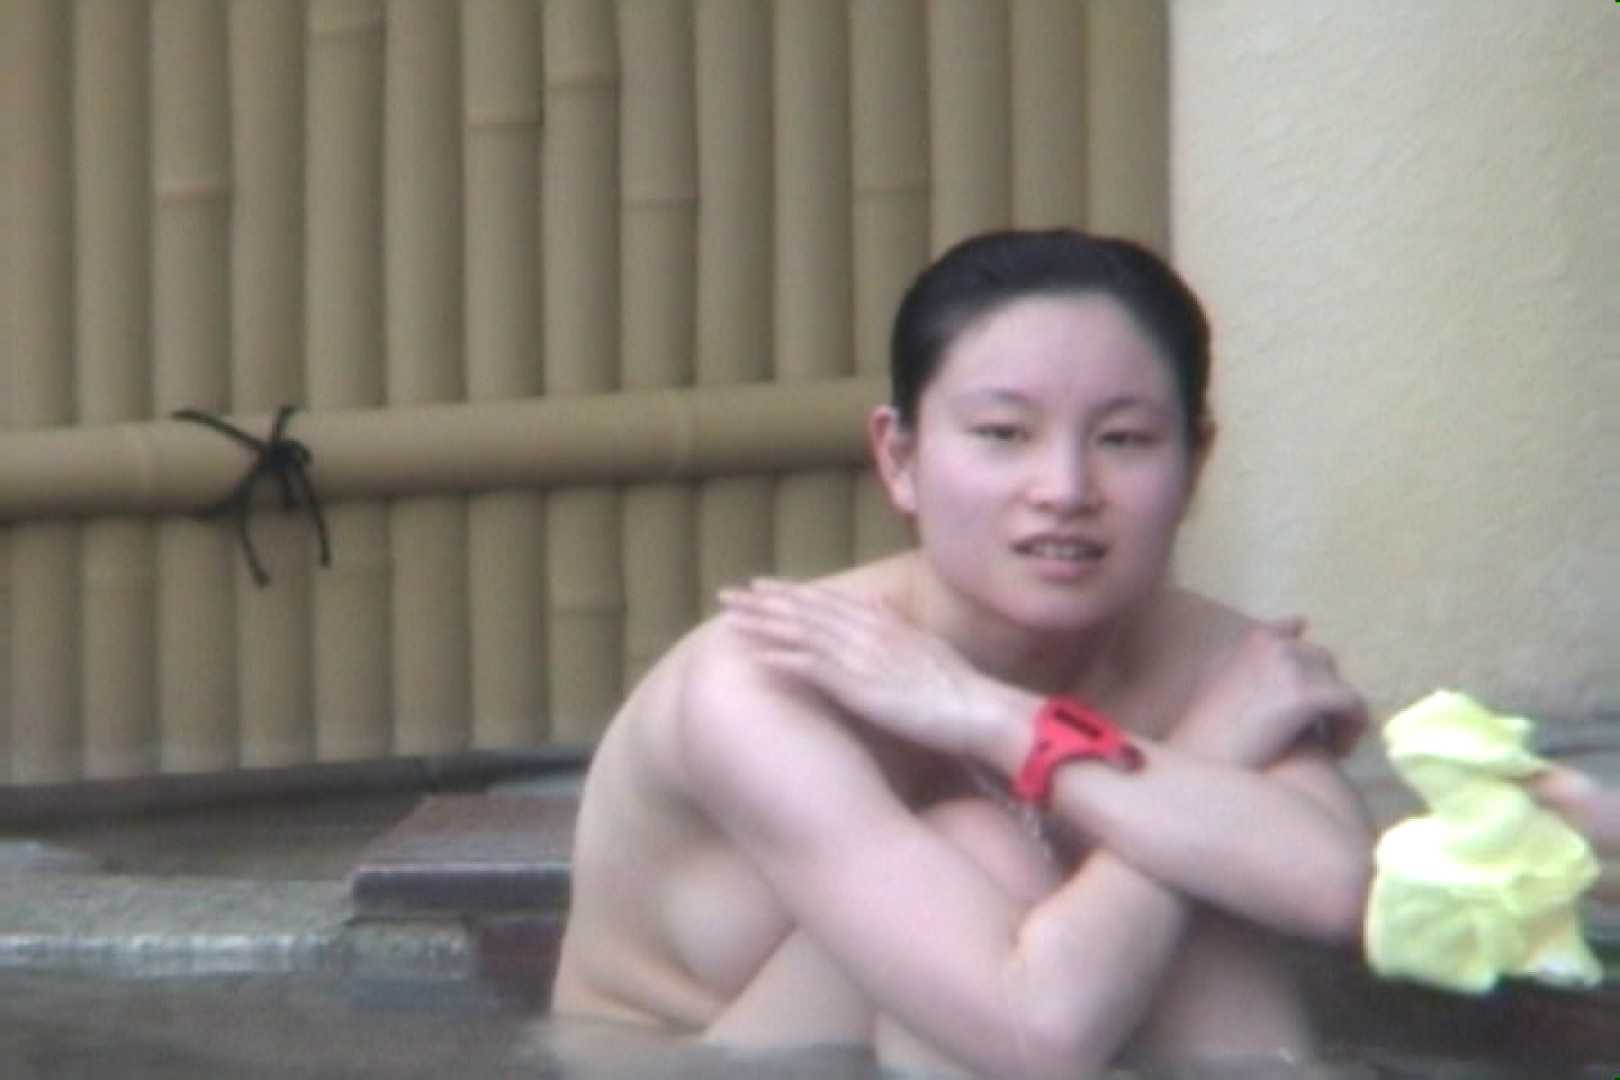 Aquaな露天風呂Vol.45【VIP限定】 HなOL   盗撮  100pic 46